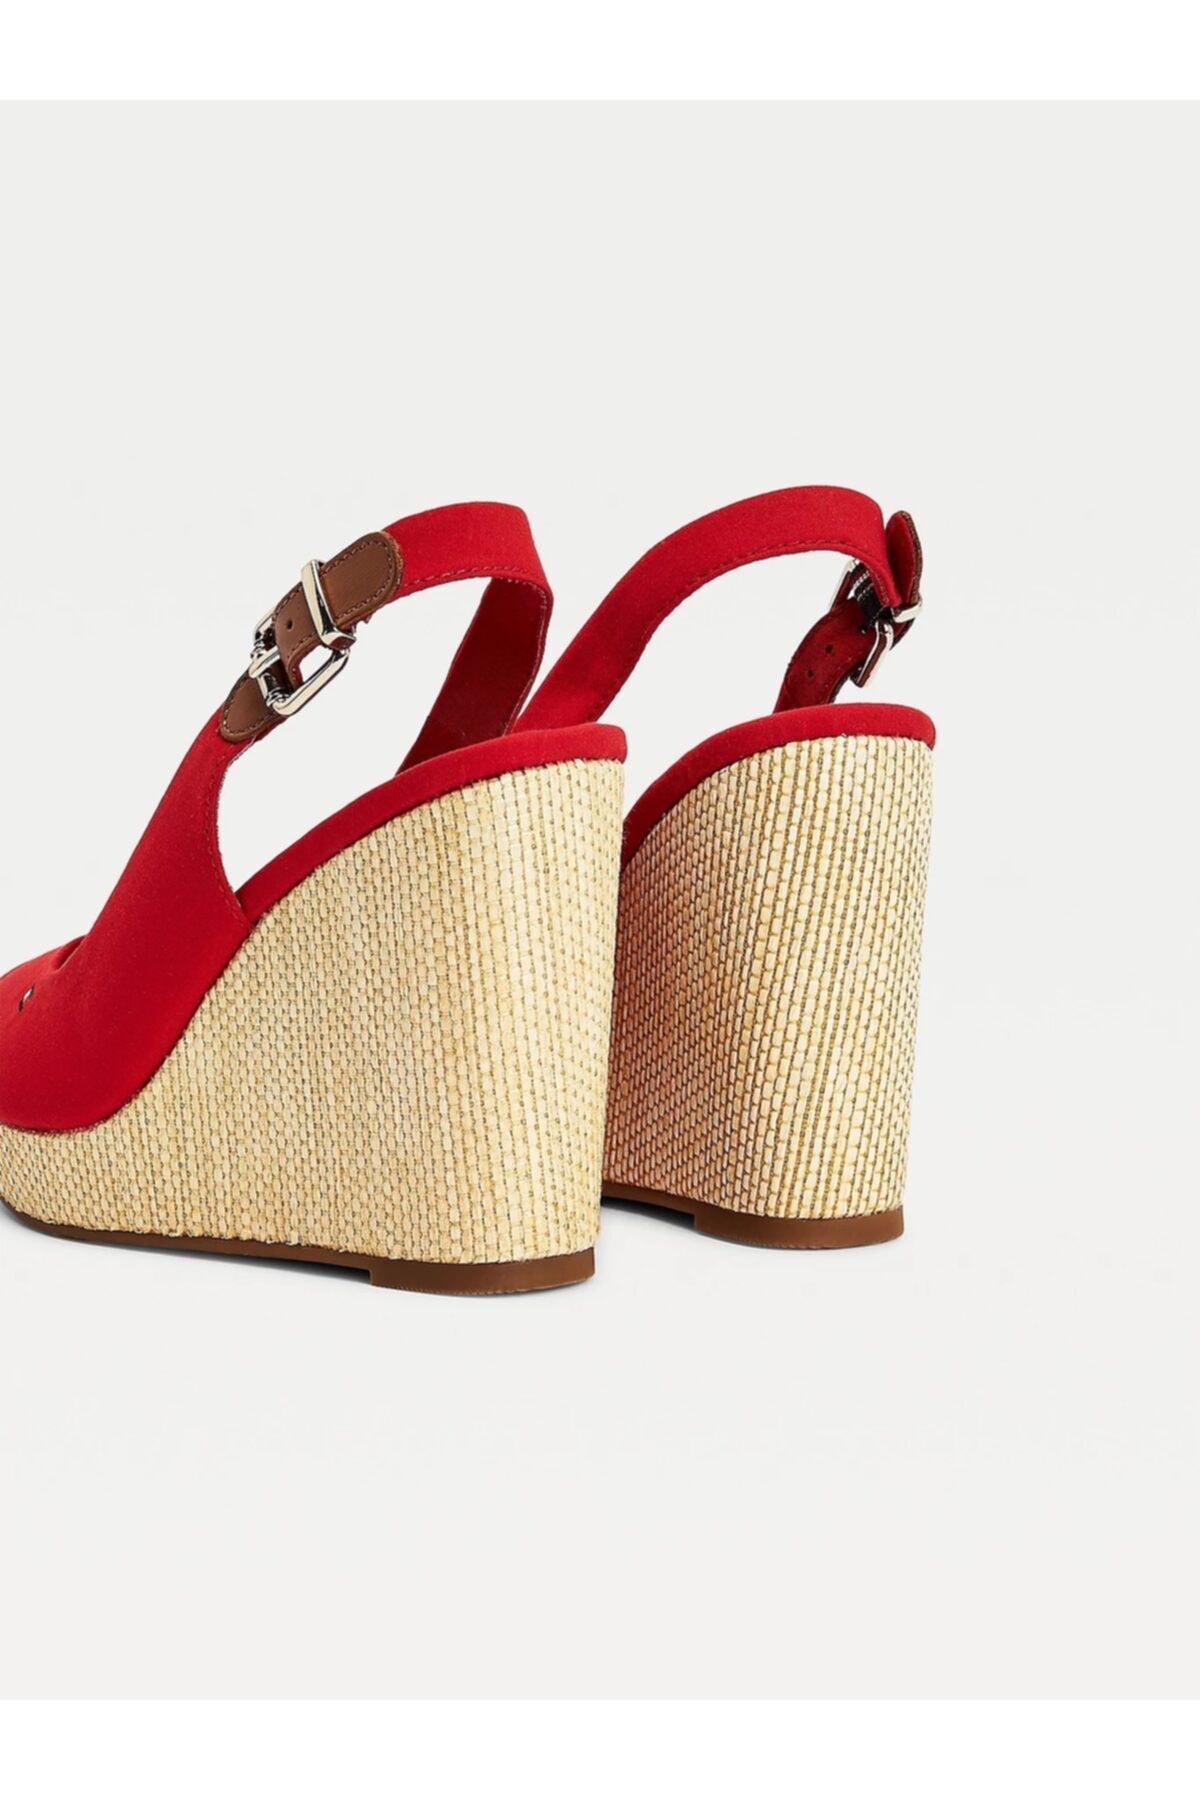 Tommy Hilfiger Kadın / Kız Sandalet ICONIC ELENA SLING BACK WEDGE FW0FW04789